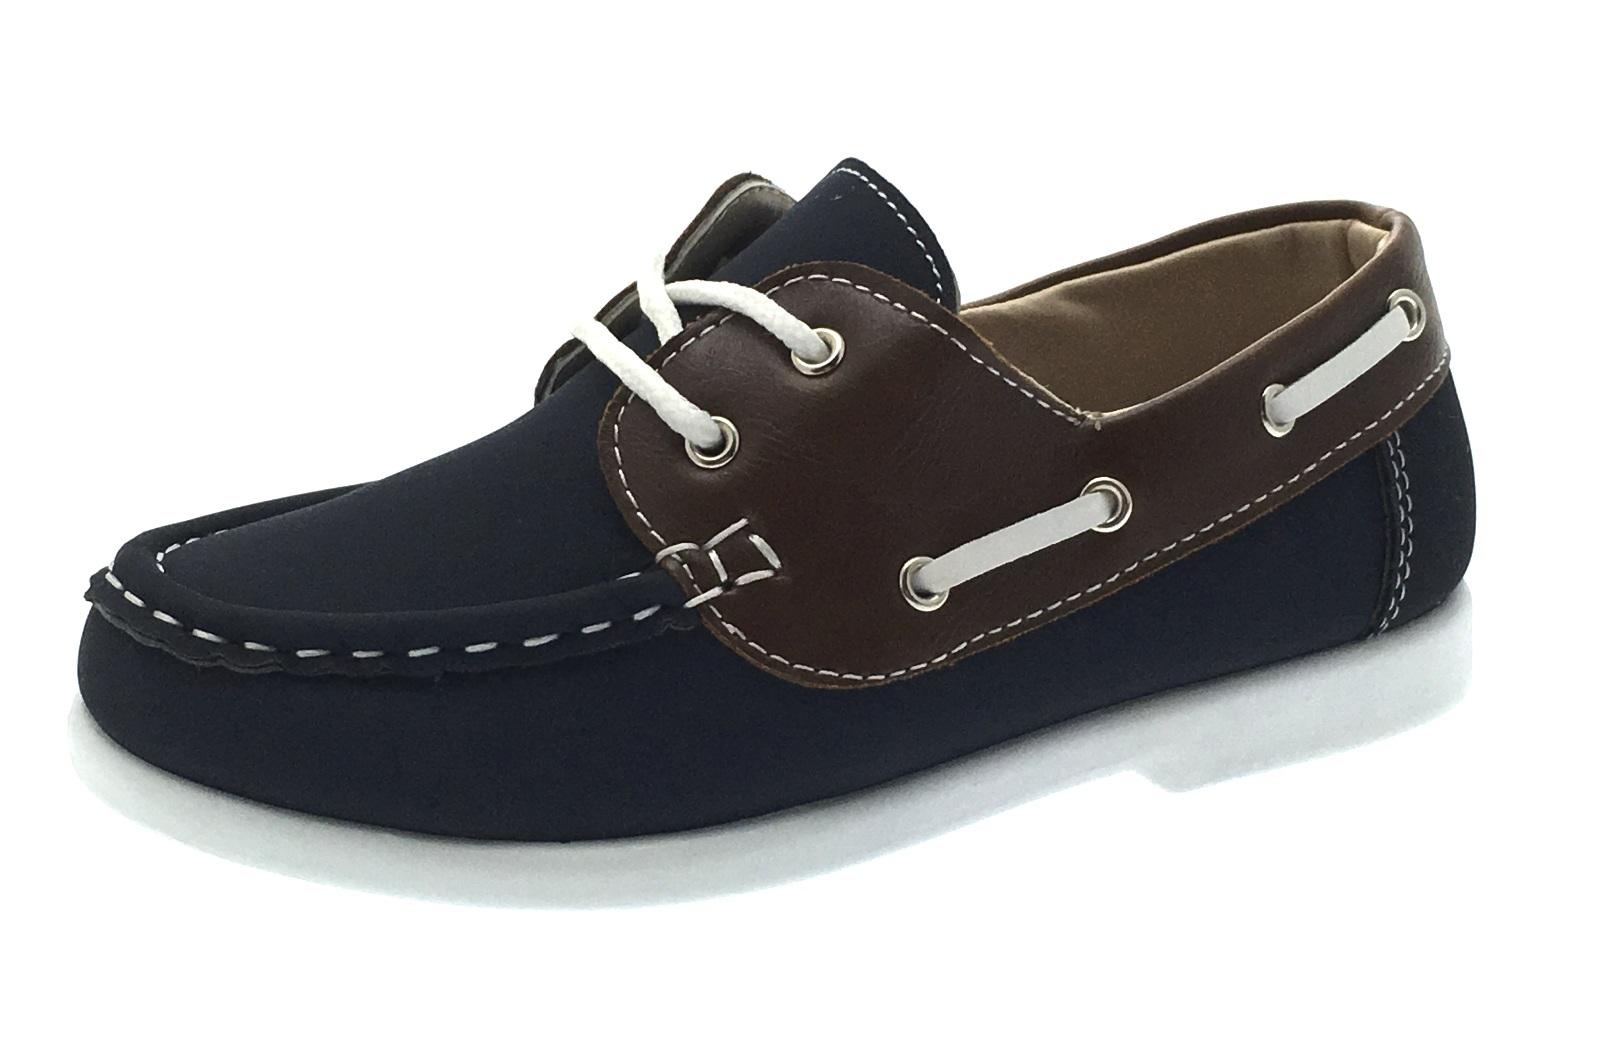 John Rocha Shoes Online